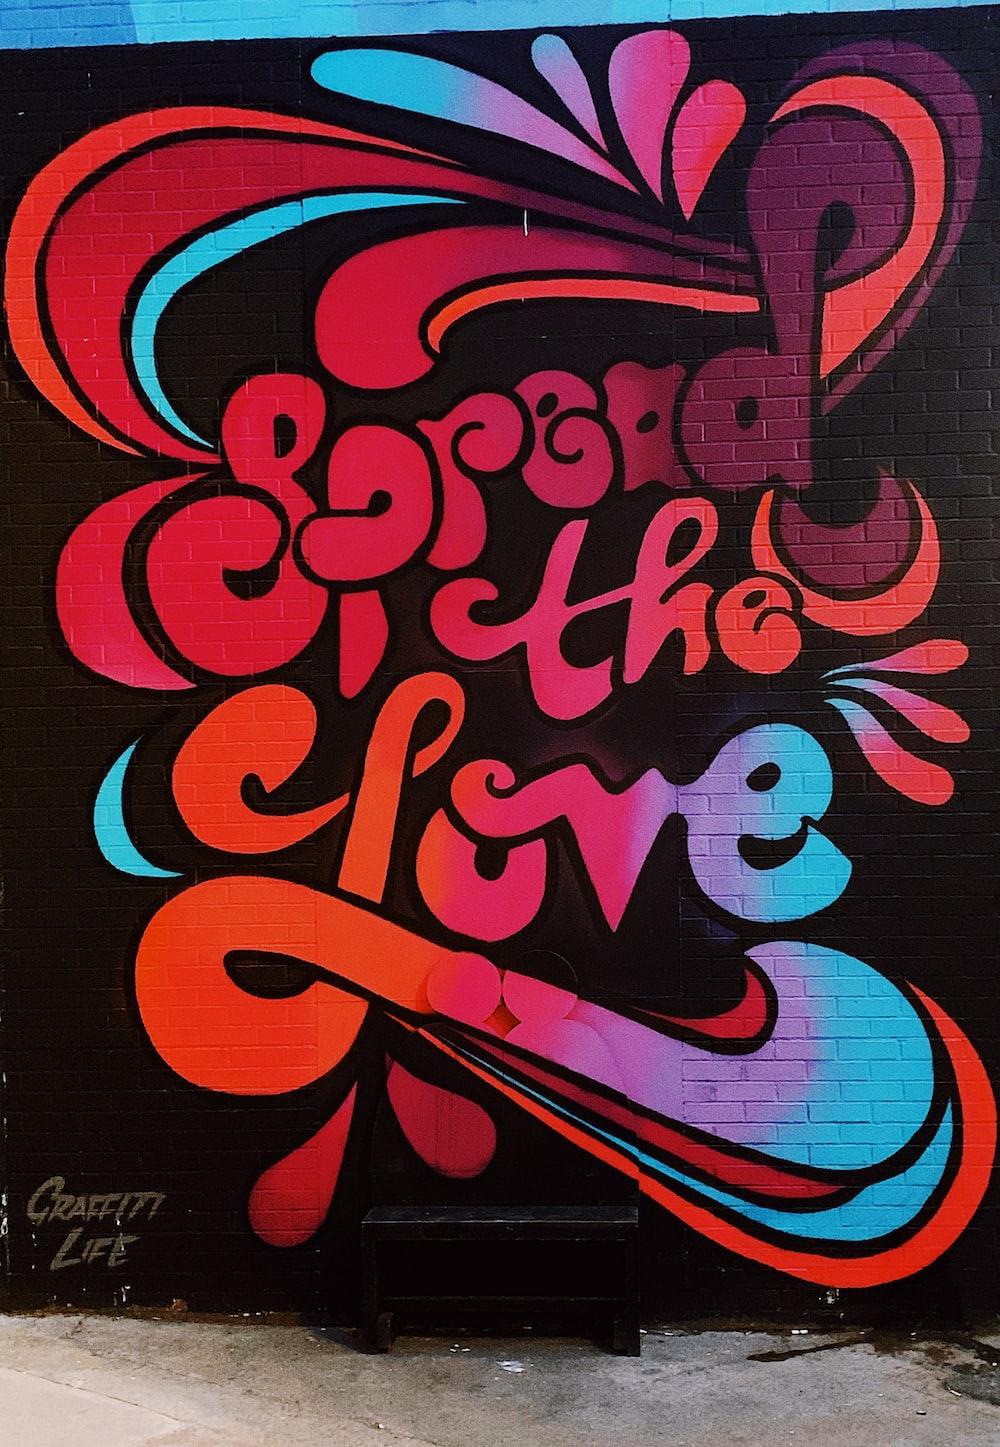 Spread the love illustration